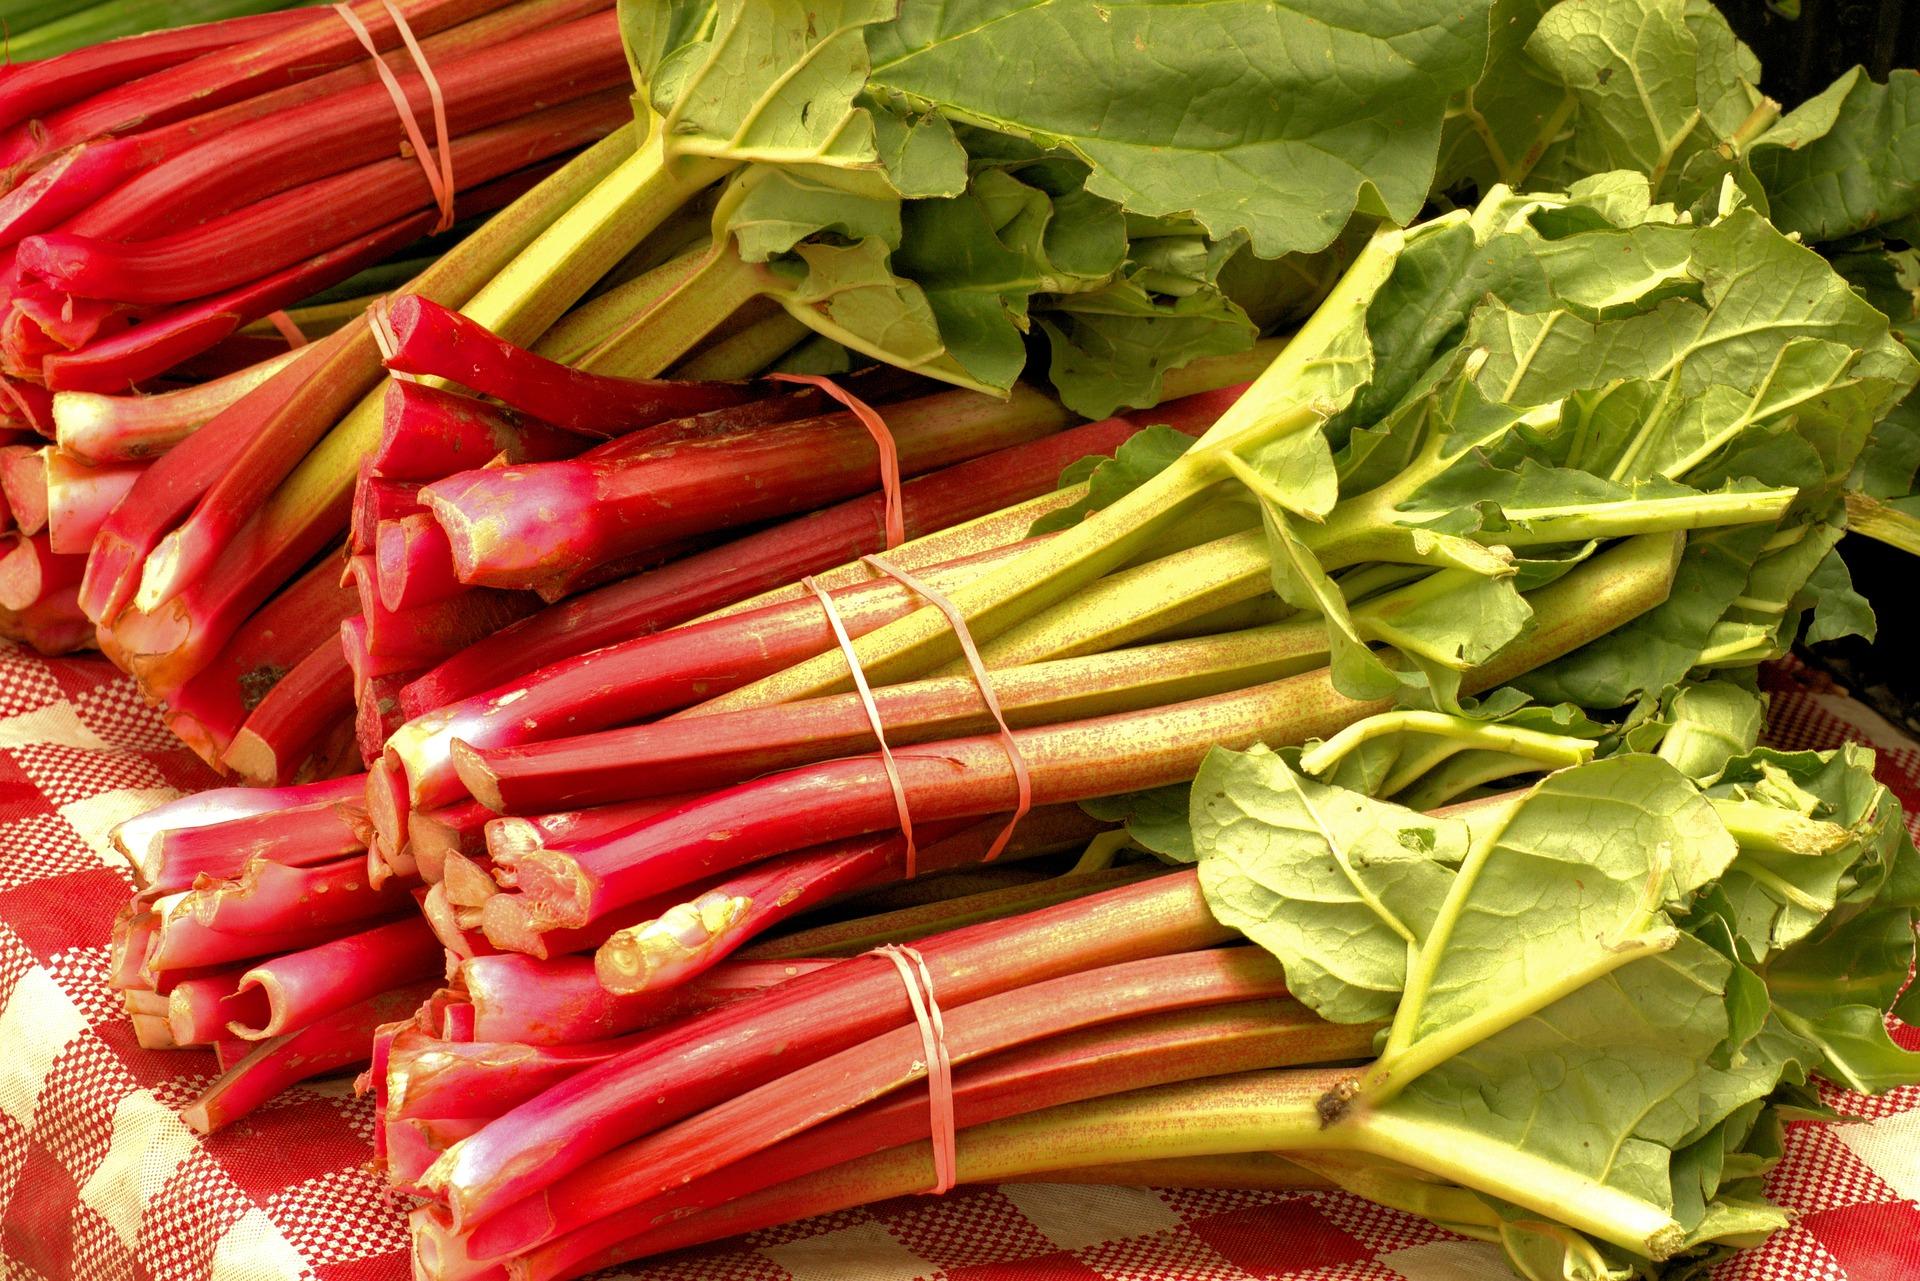 market-fresh-rhubarb-3503166_1920.jpg